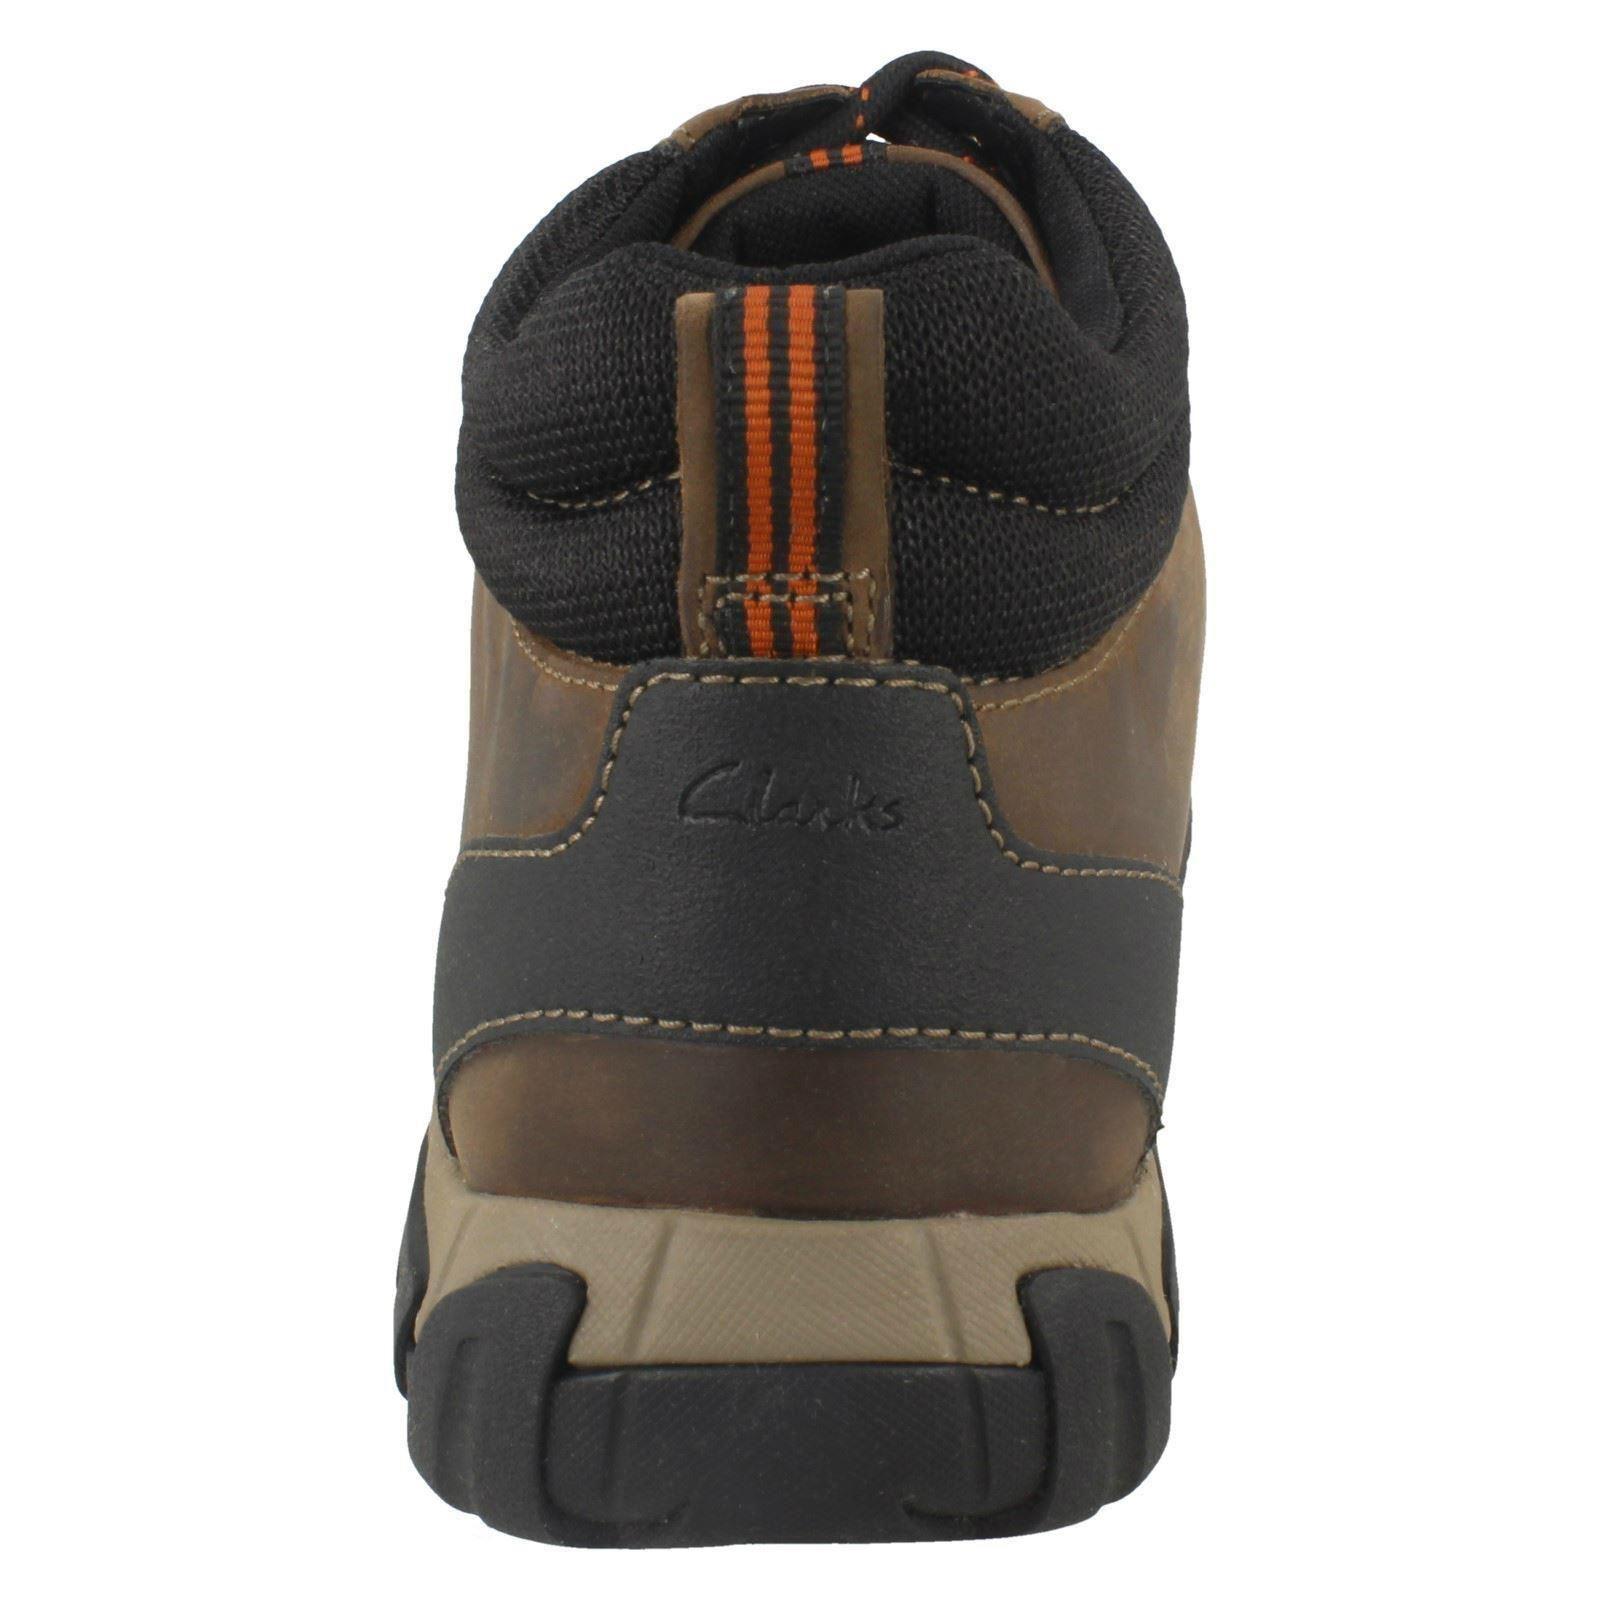 Botas al Tobillo Para Hombre casuales Clarks Clarks casuales Impermeable Etiqueta-Walbeck Top II 82545e